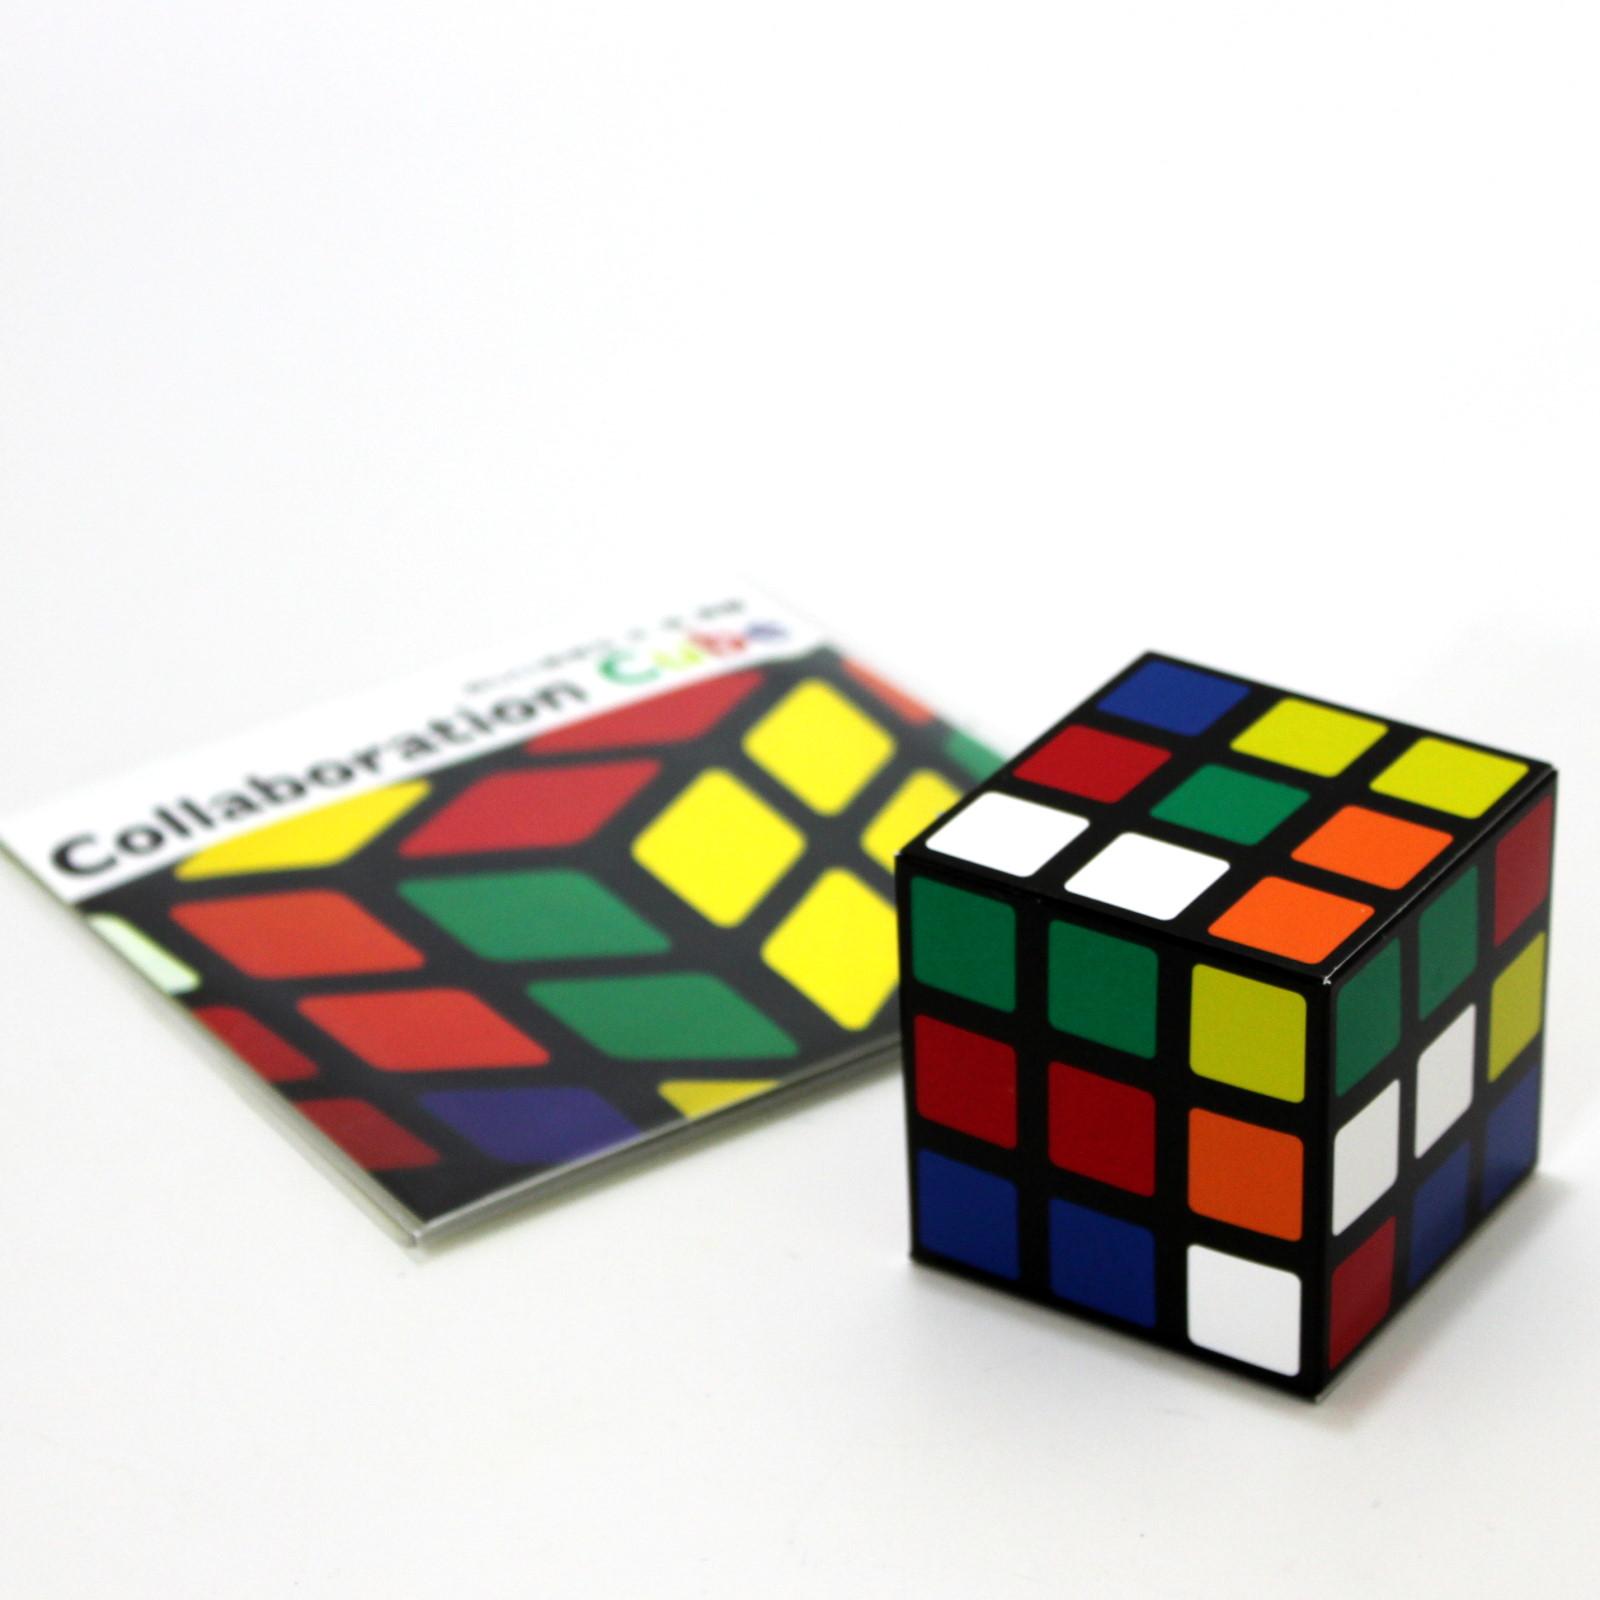 Collaboration Cube by Akira Fujii, Hideki Tani